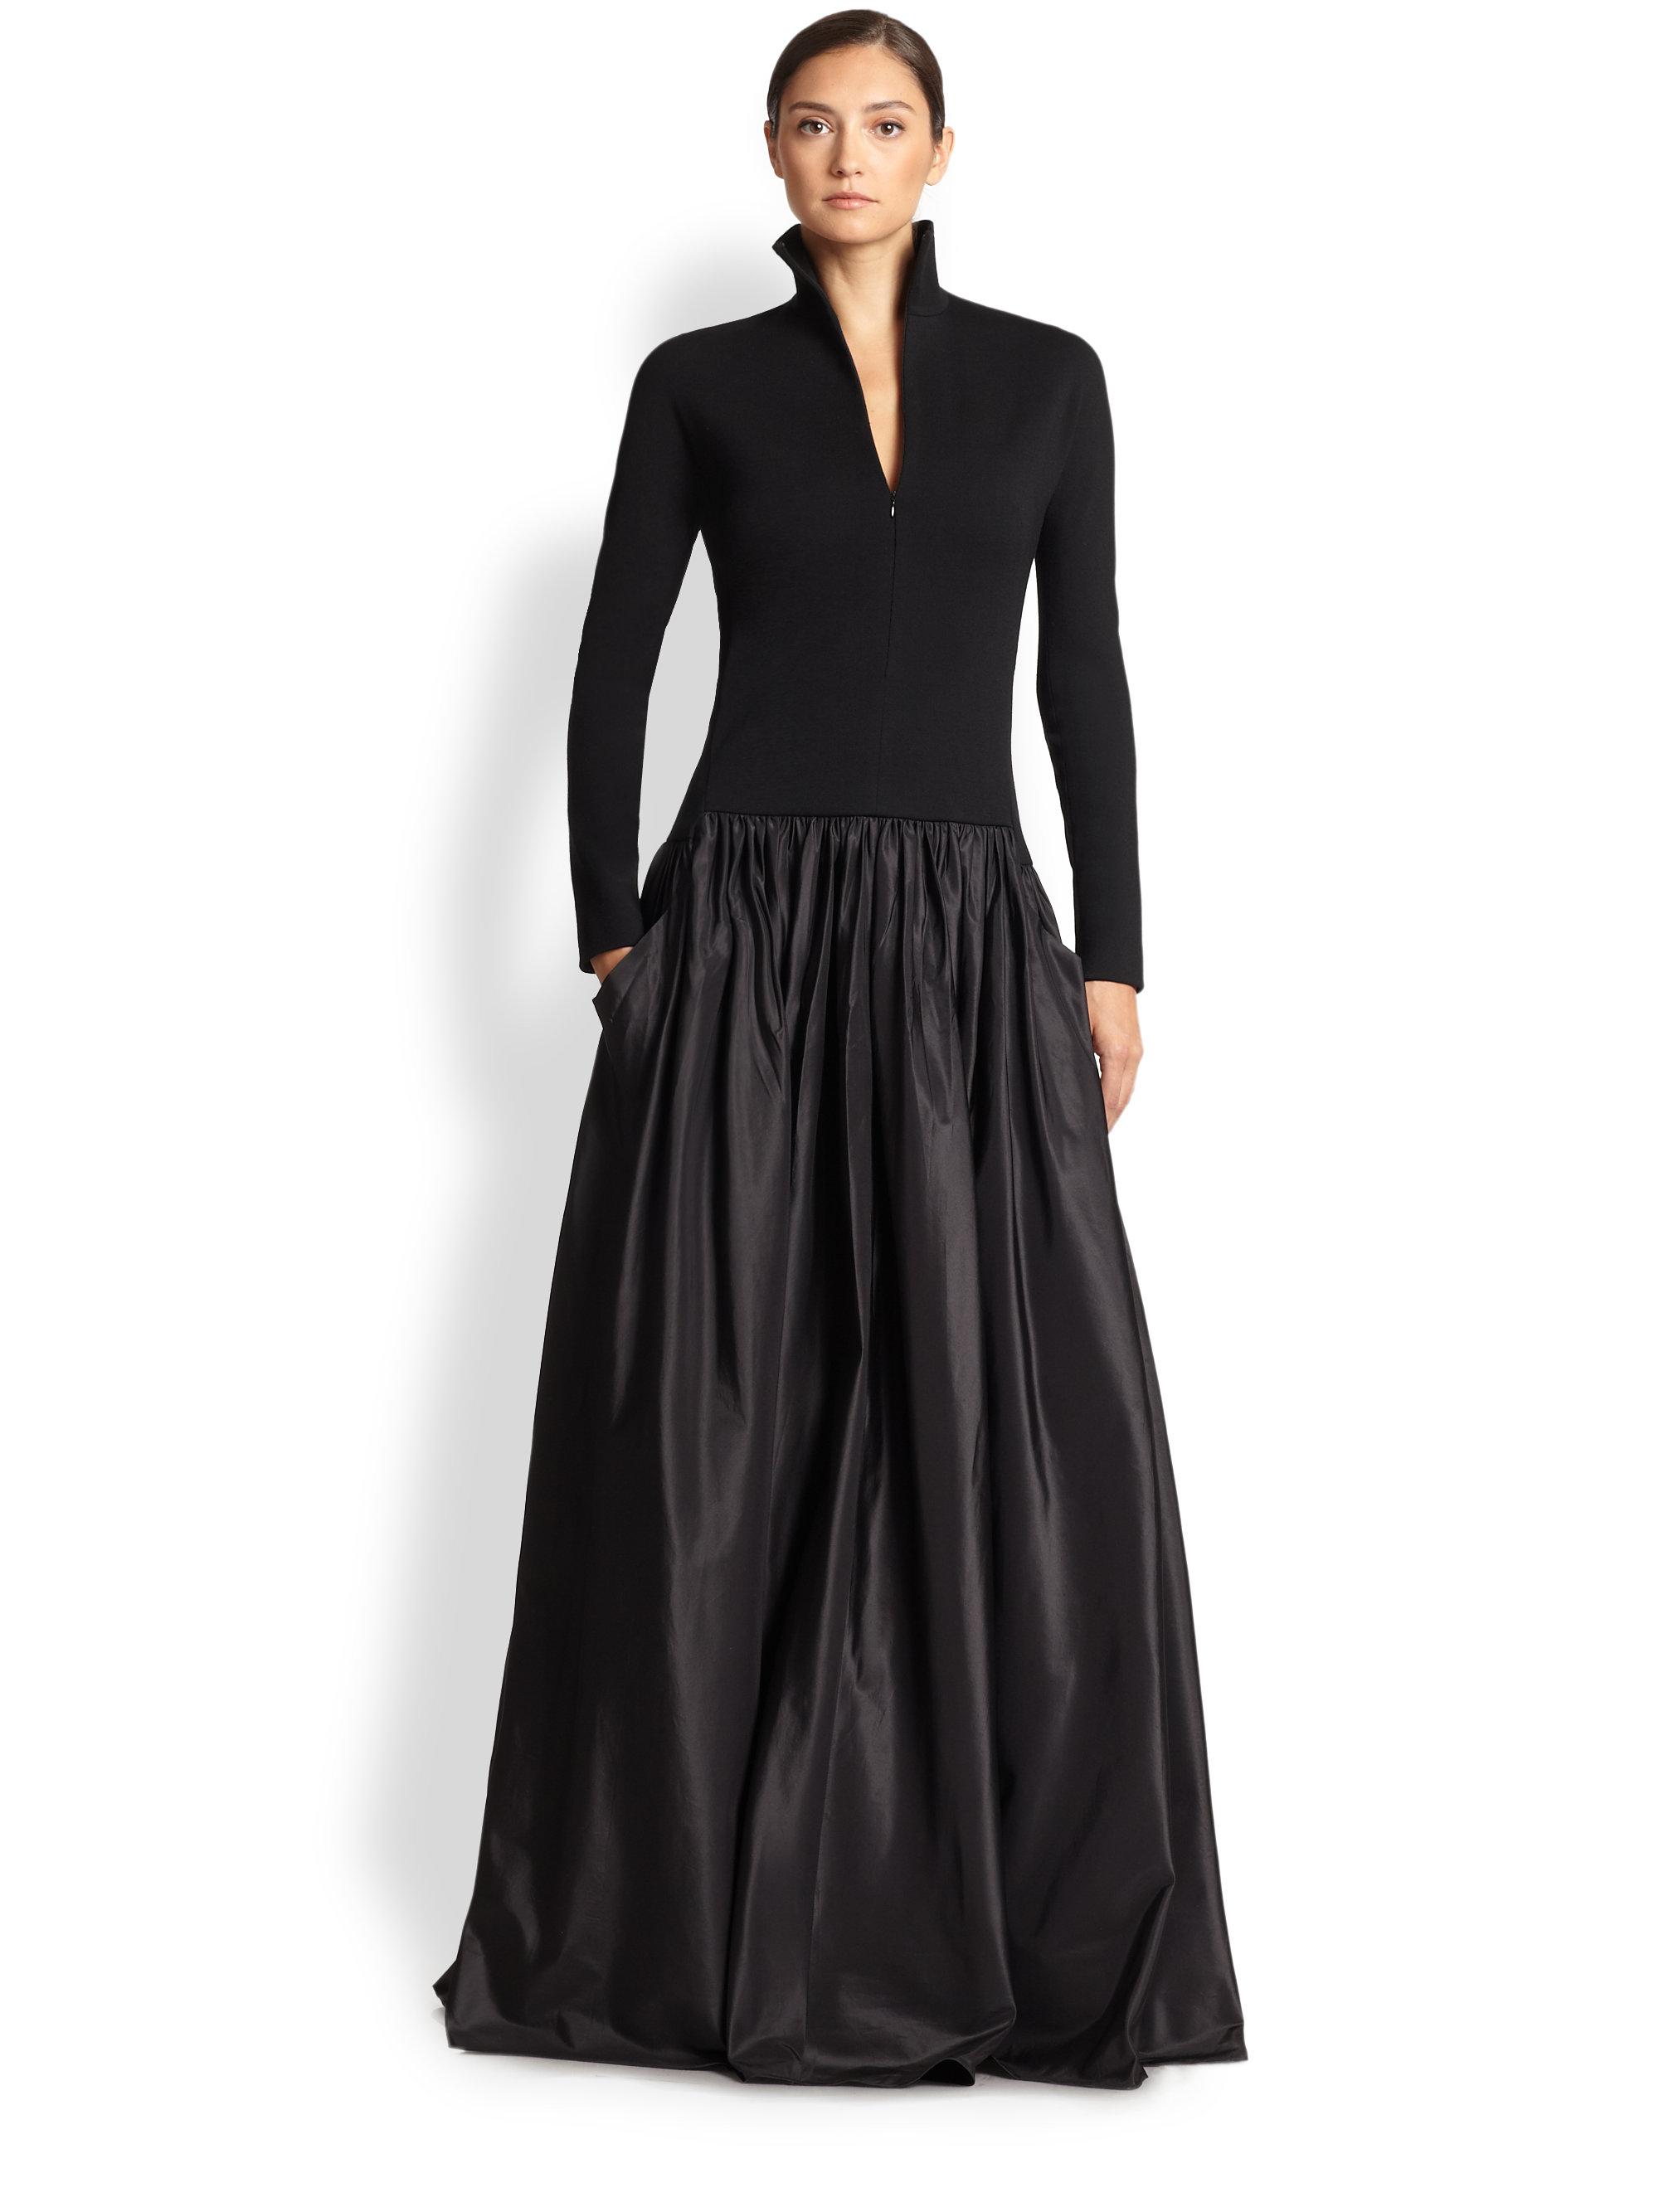 Akris Wool & Silk Taffeta Gown in Black